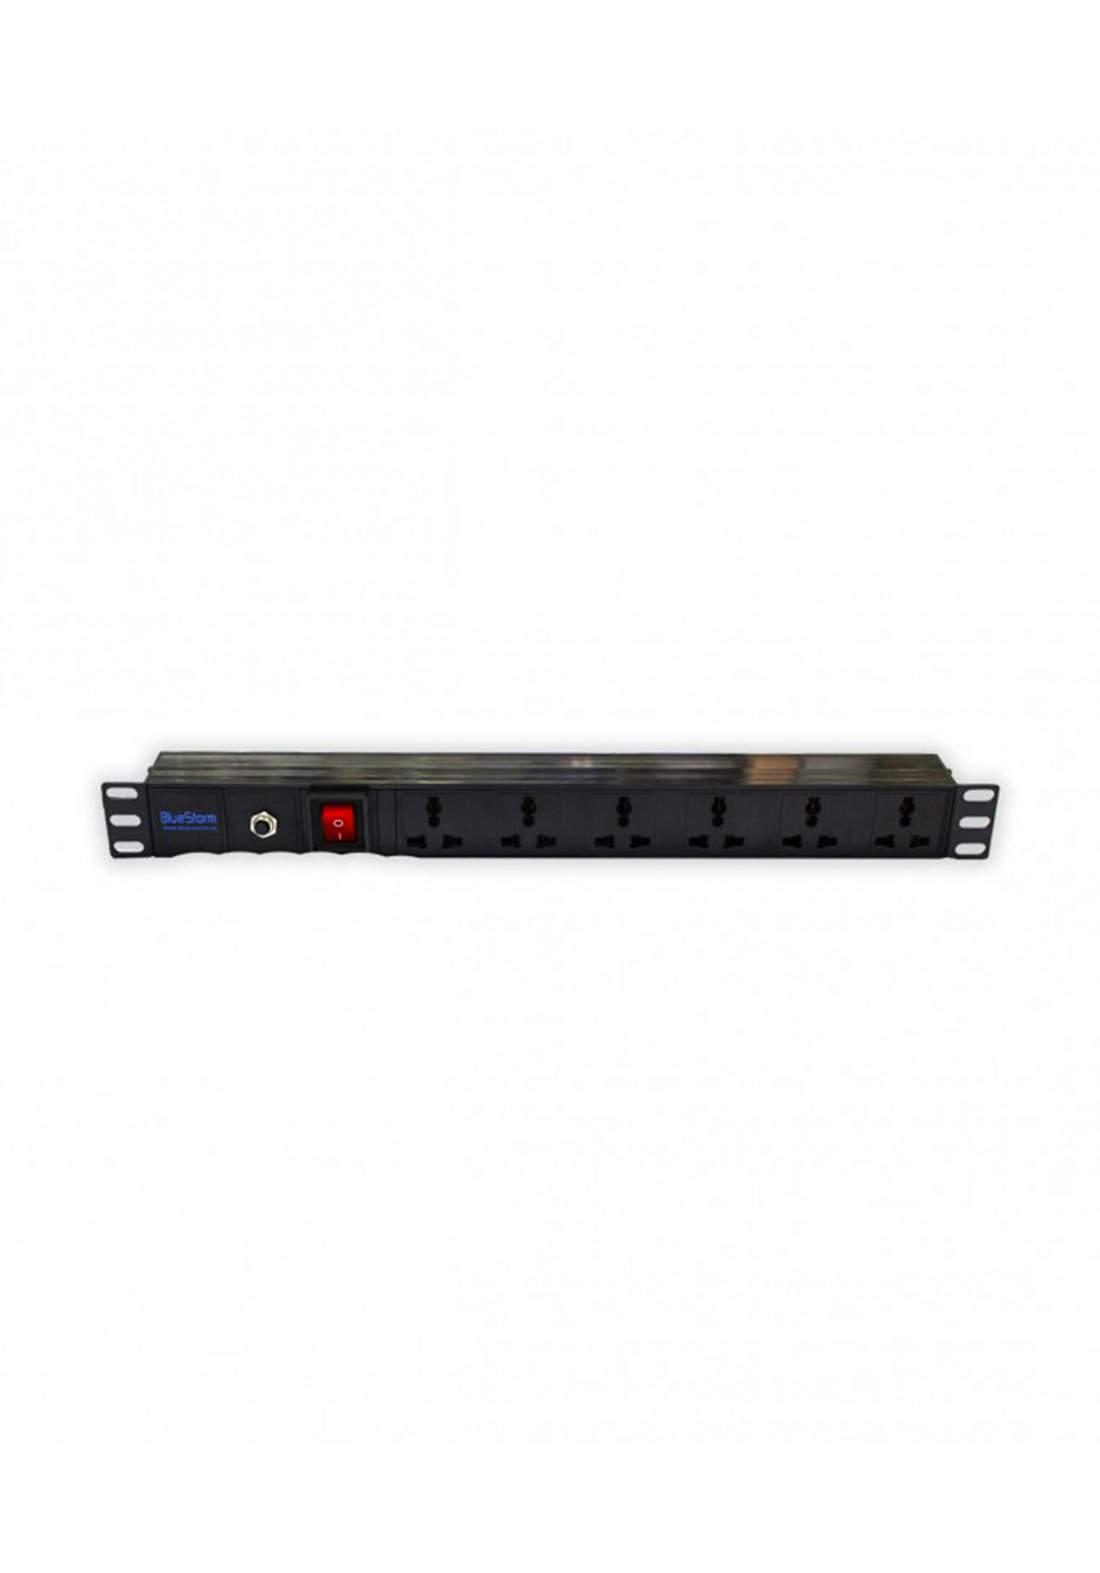 Blue storm PDU 7 port Power Distrbuter - Black